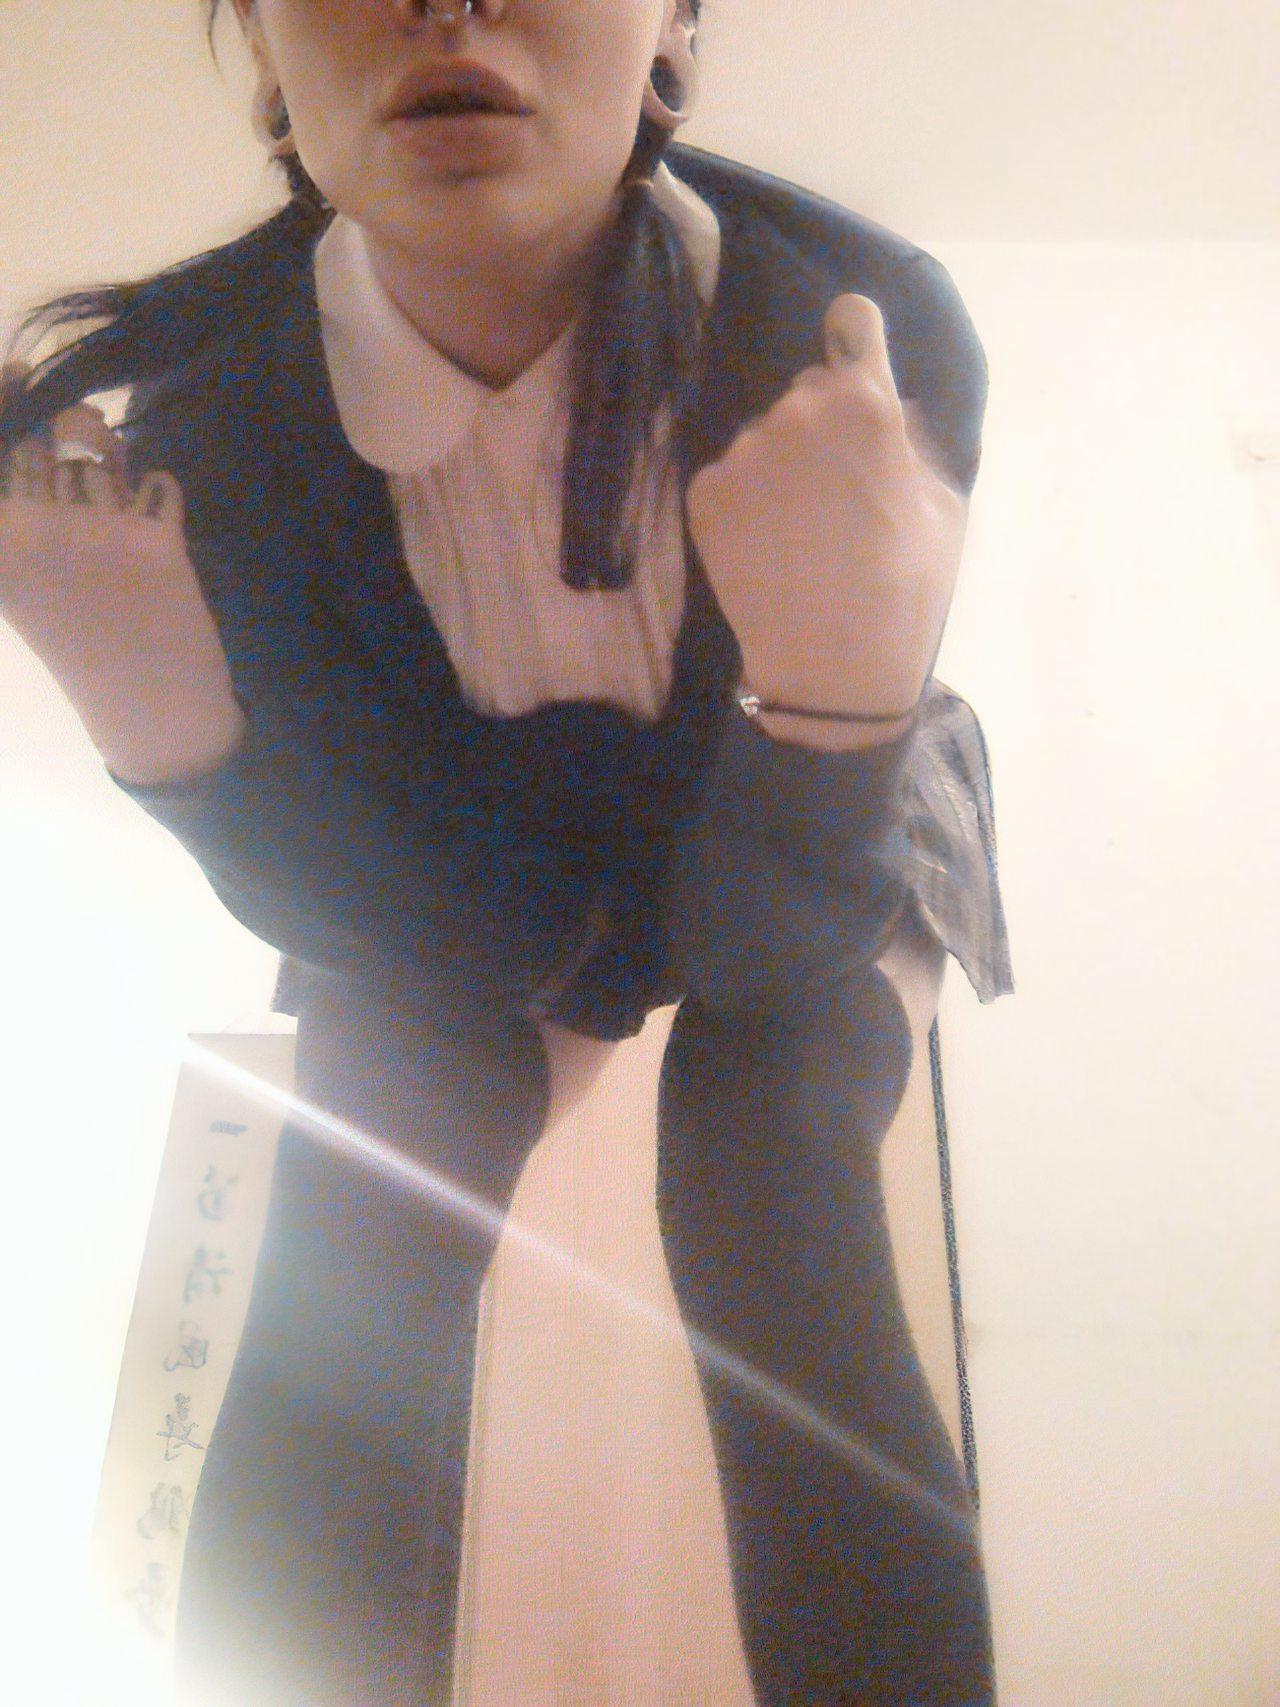 Emo Girl (14)